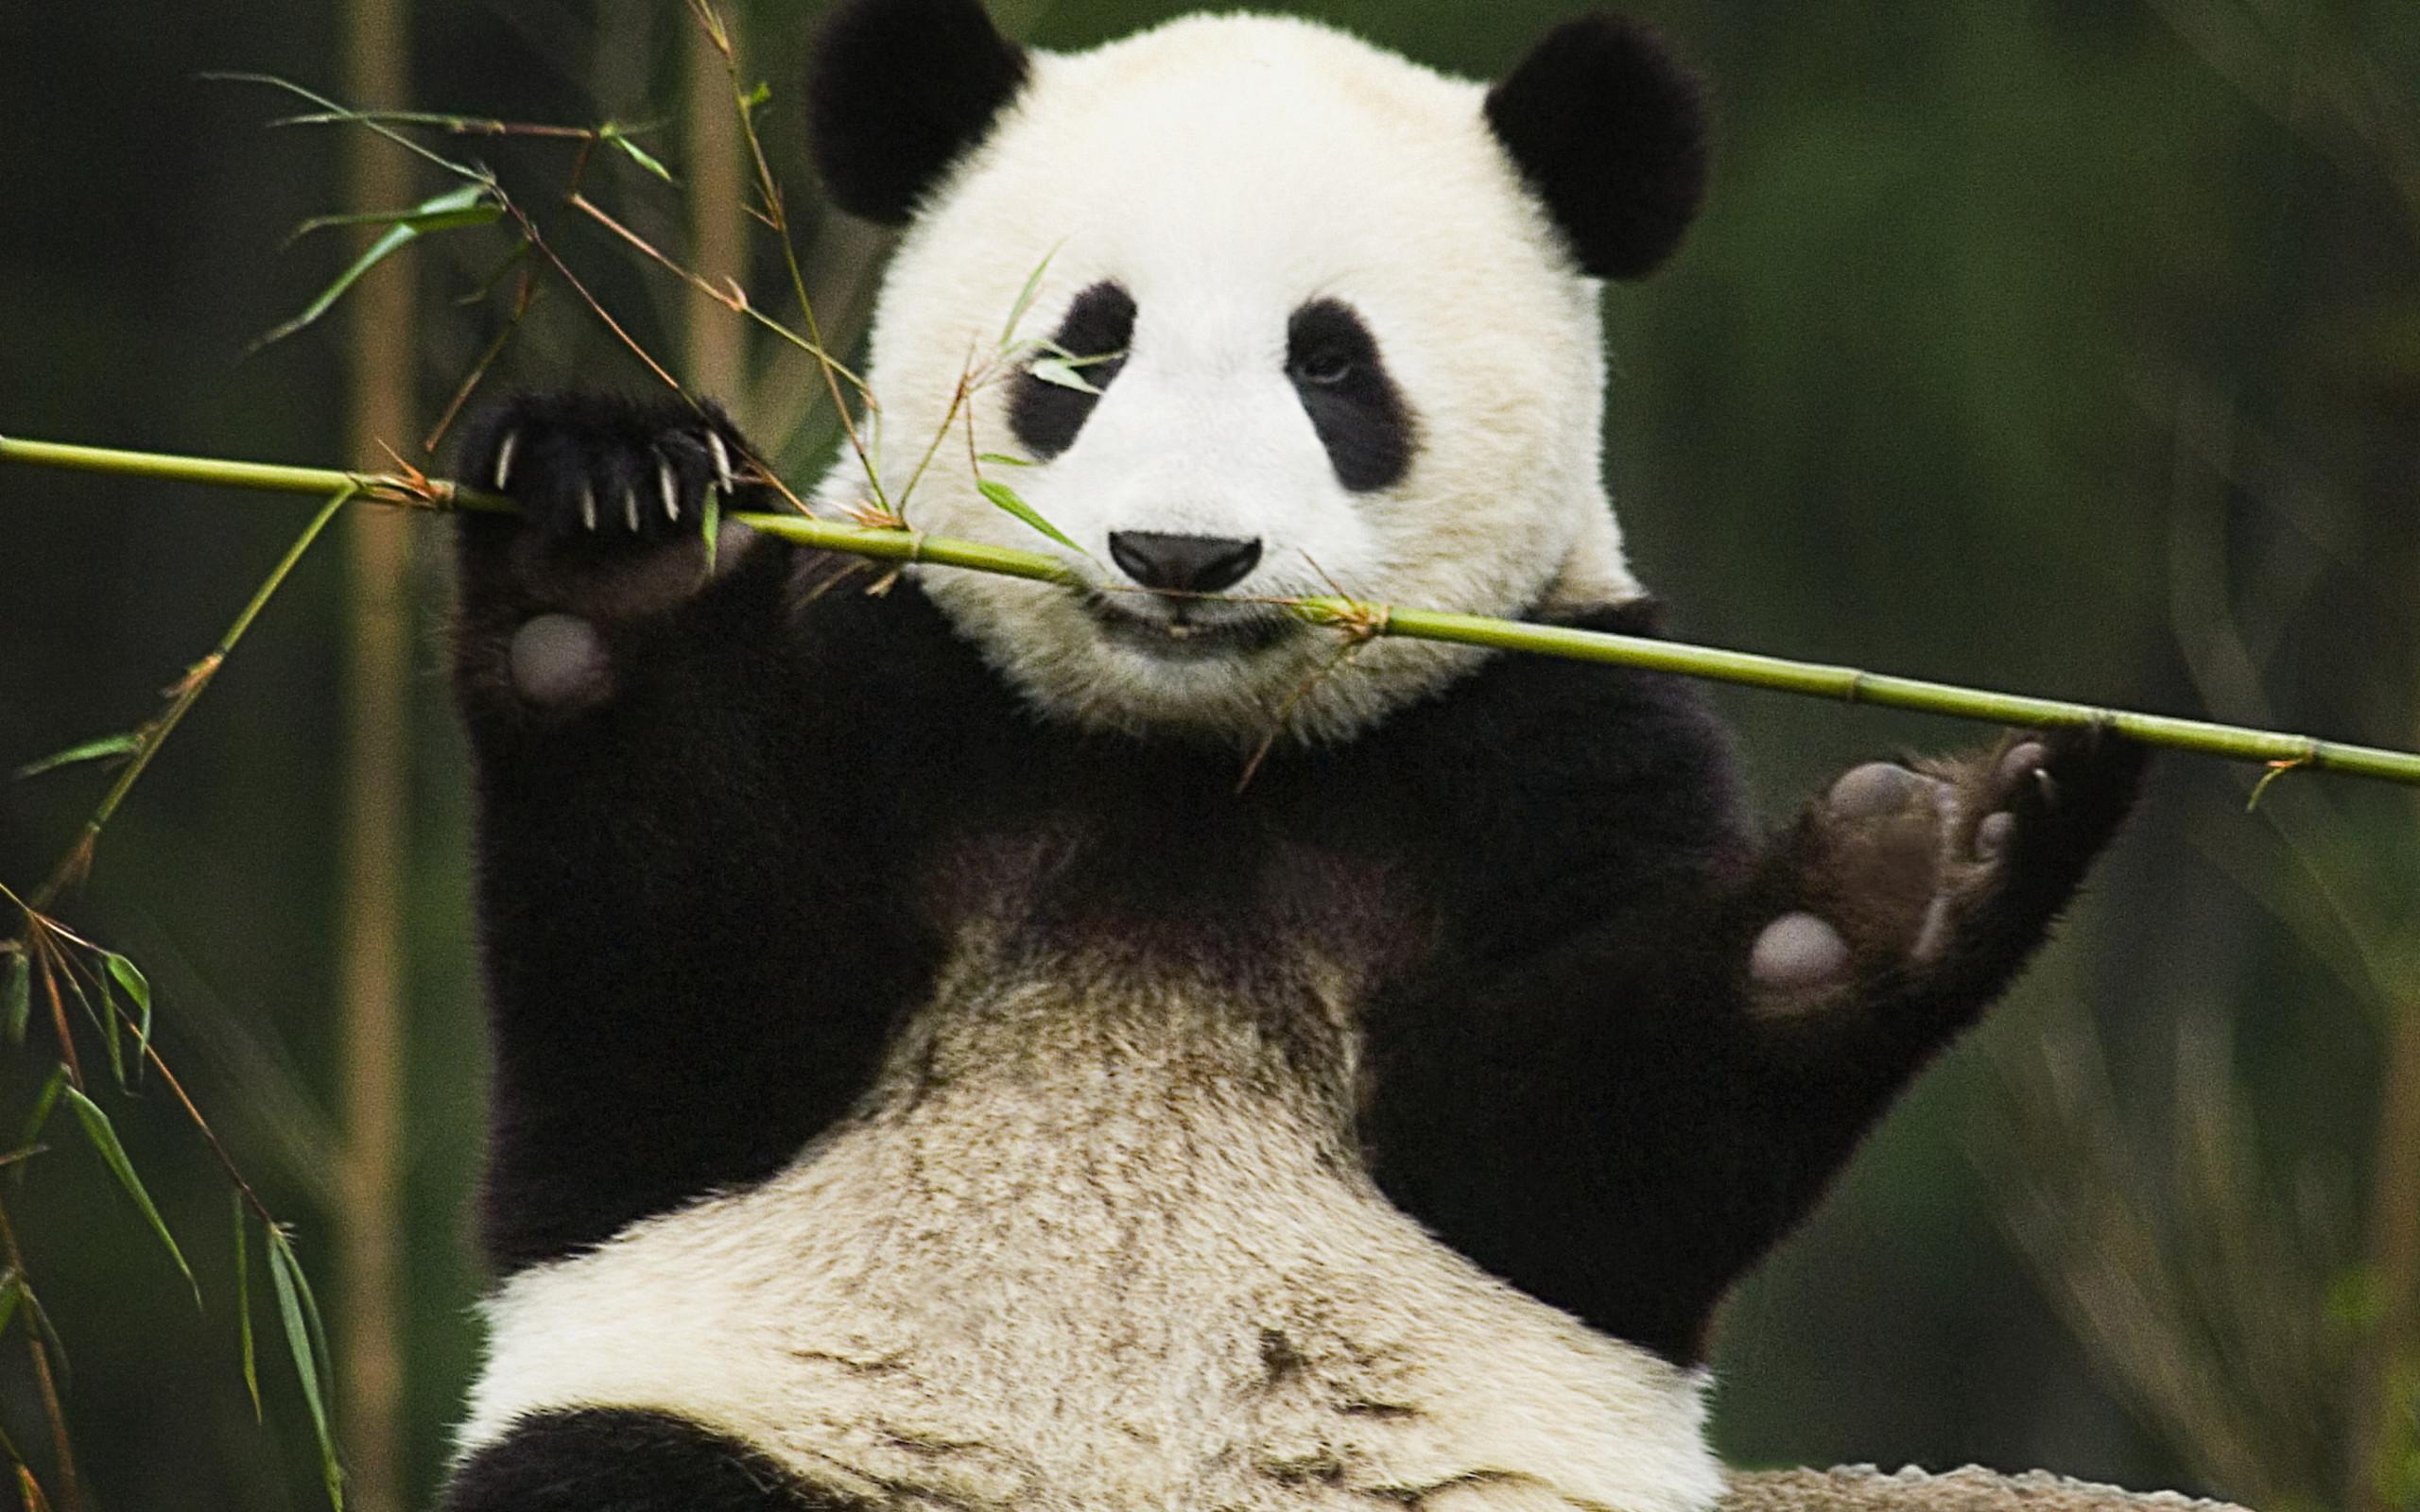 Iphone 5 Cute Panda Wallpaper Panda Hd Wallpaper Background Image 2560x1600 Id